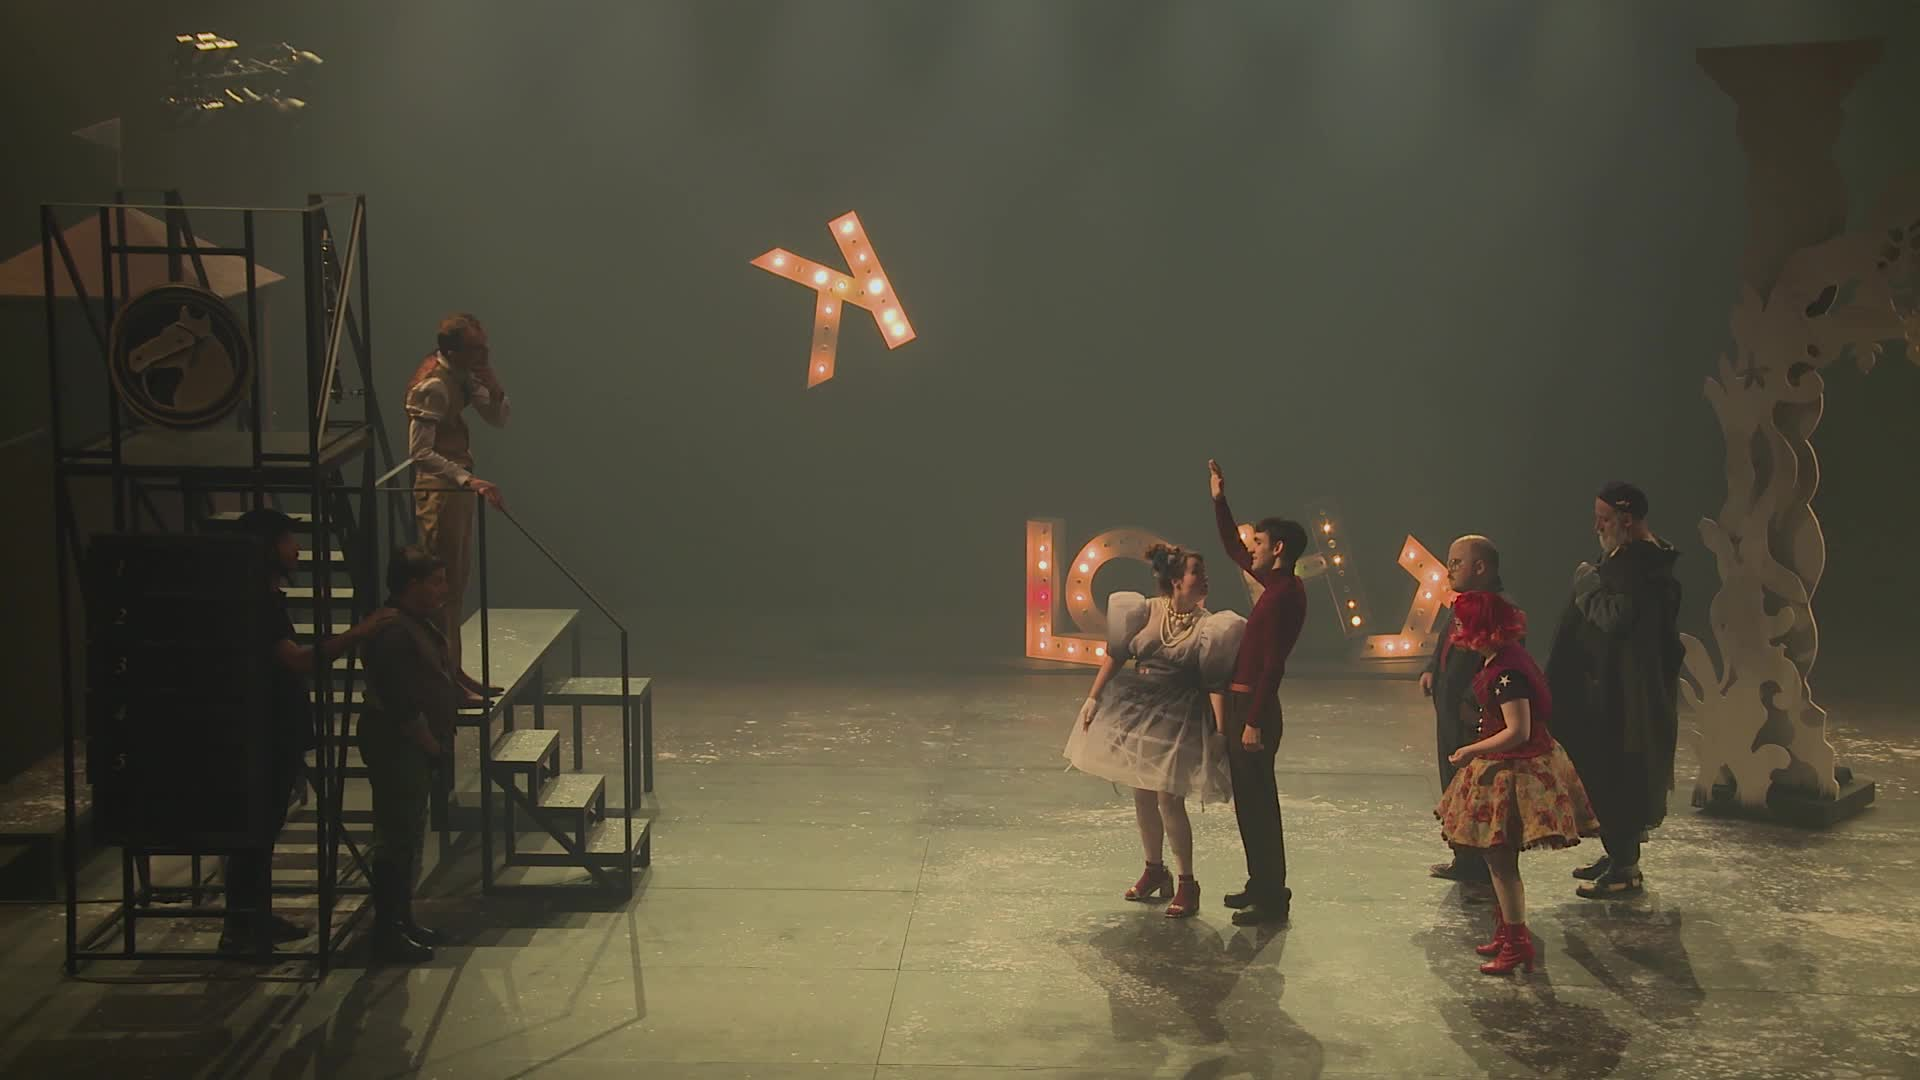 "Vidéo ""Le Grand théâtre d'Oklahama"" - M. Louarn, J.-F. Auguste - Extraits"